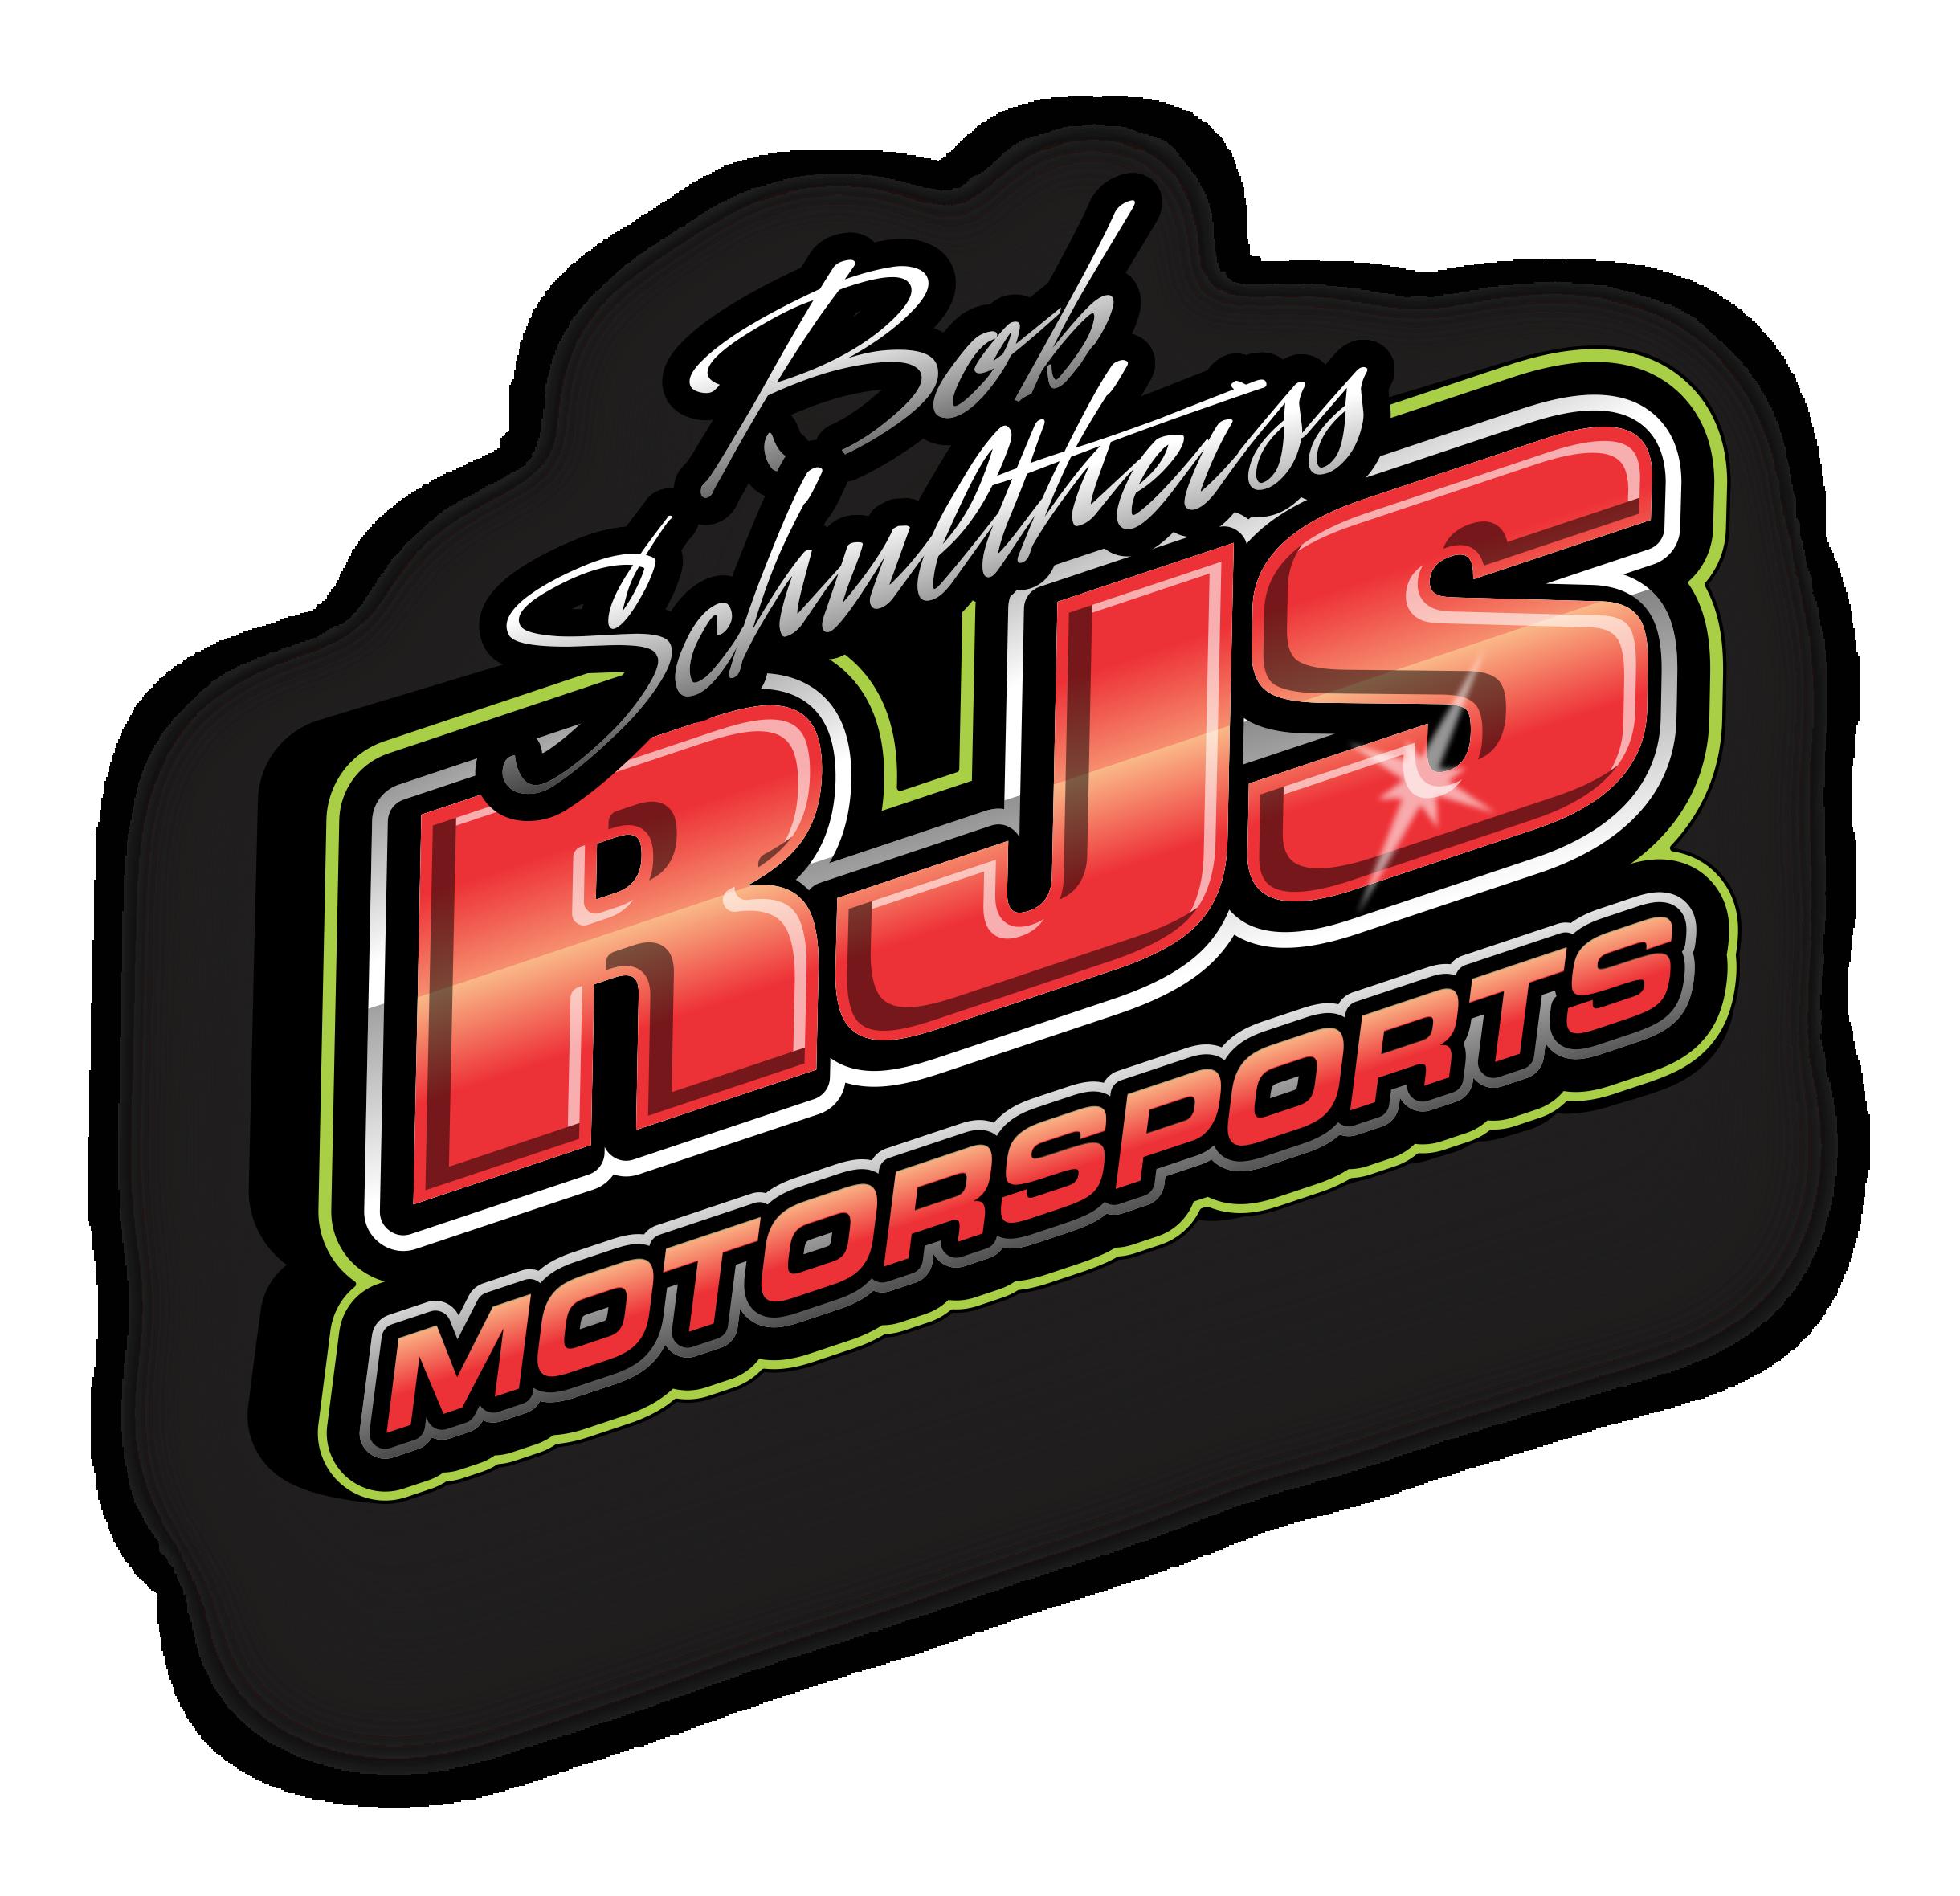 RJS Motorsports